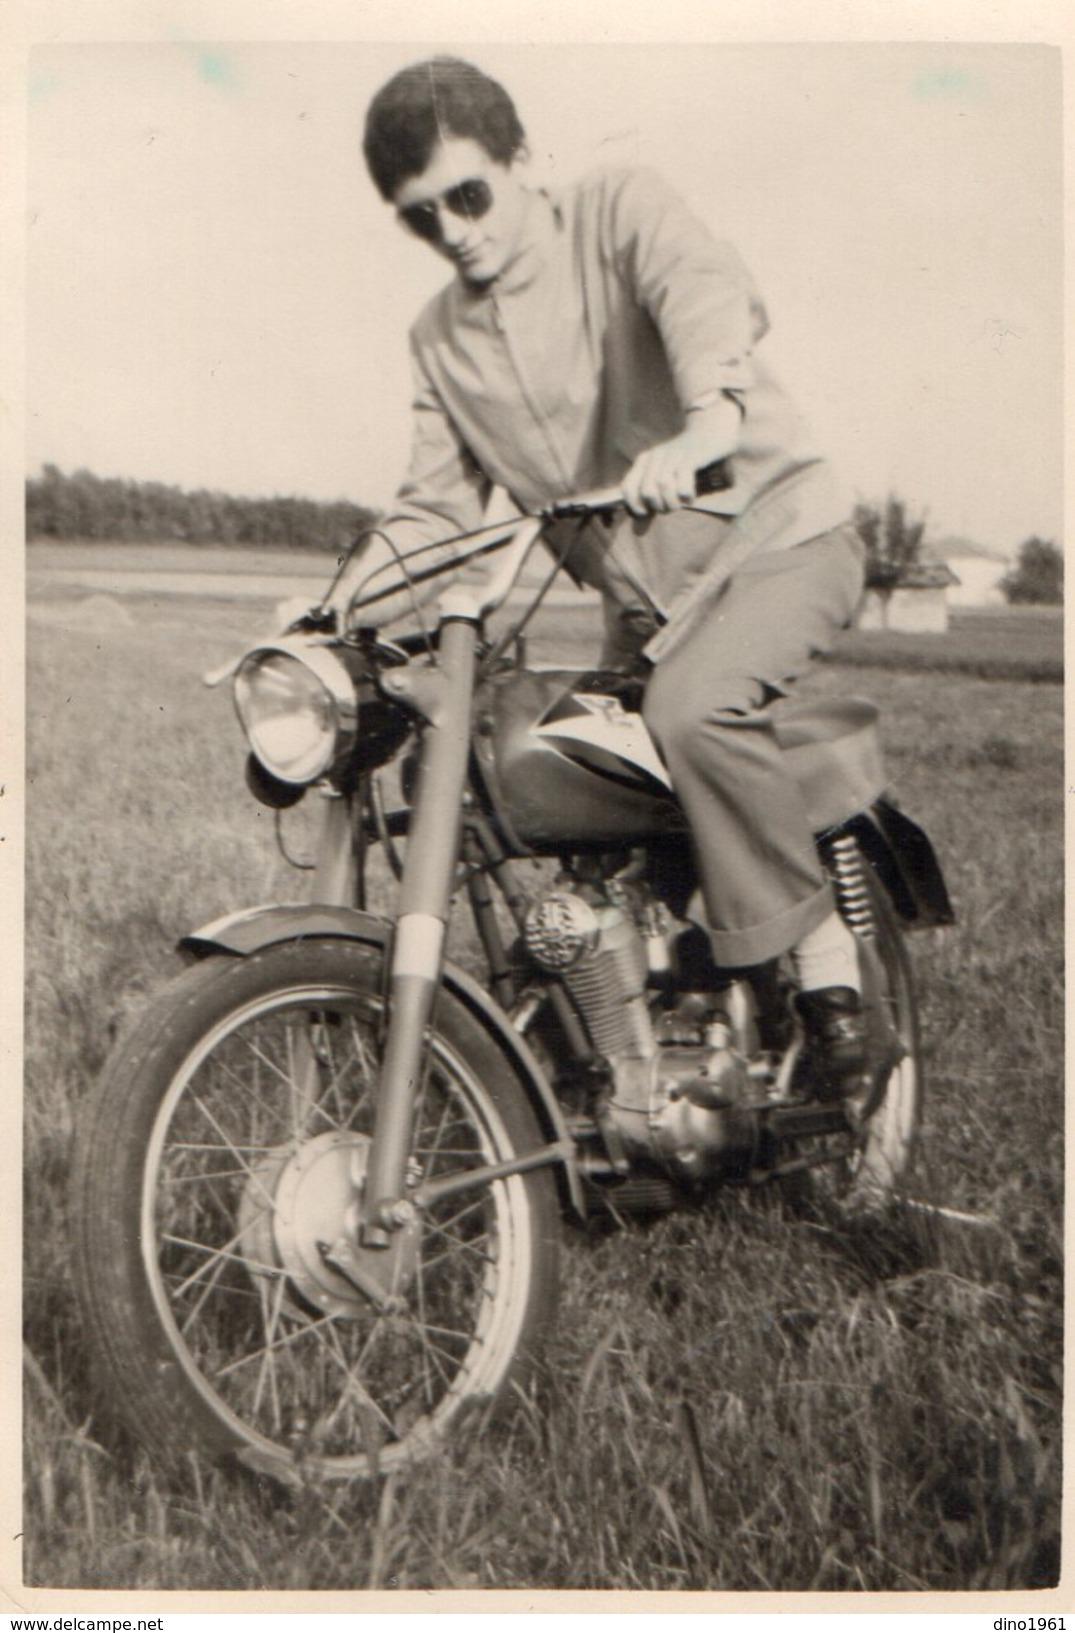 PHOTO 396 - Photo Originale 7 X 10 - Motocylette - Moto - Photographs